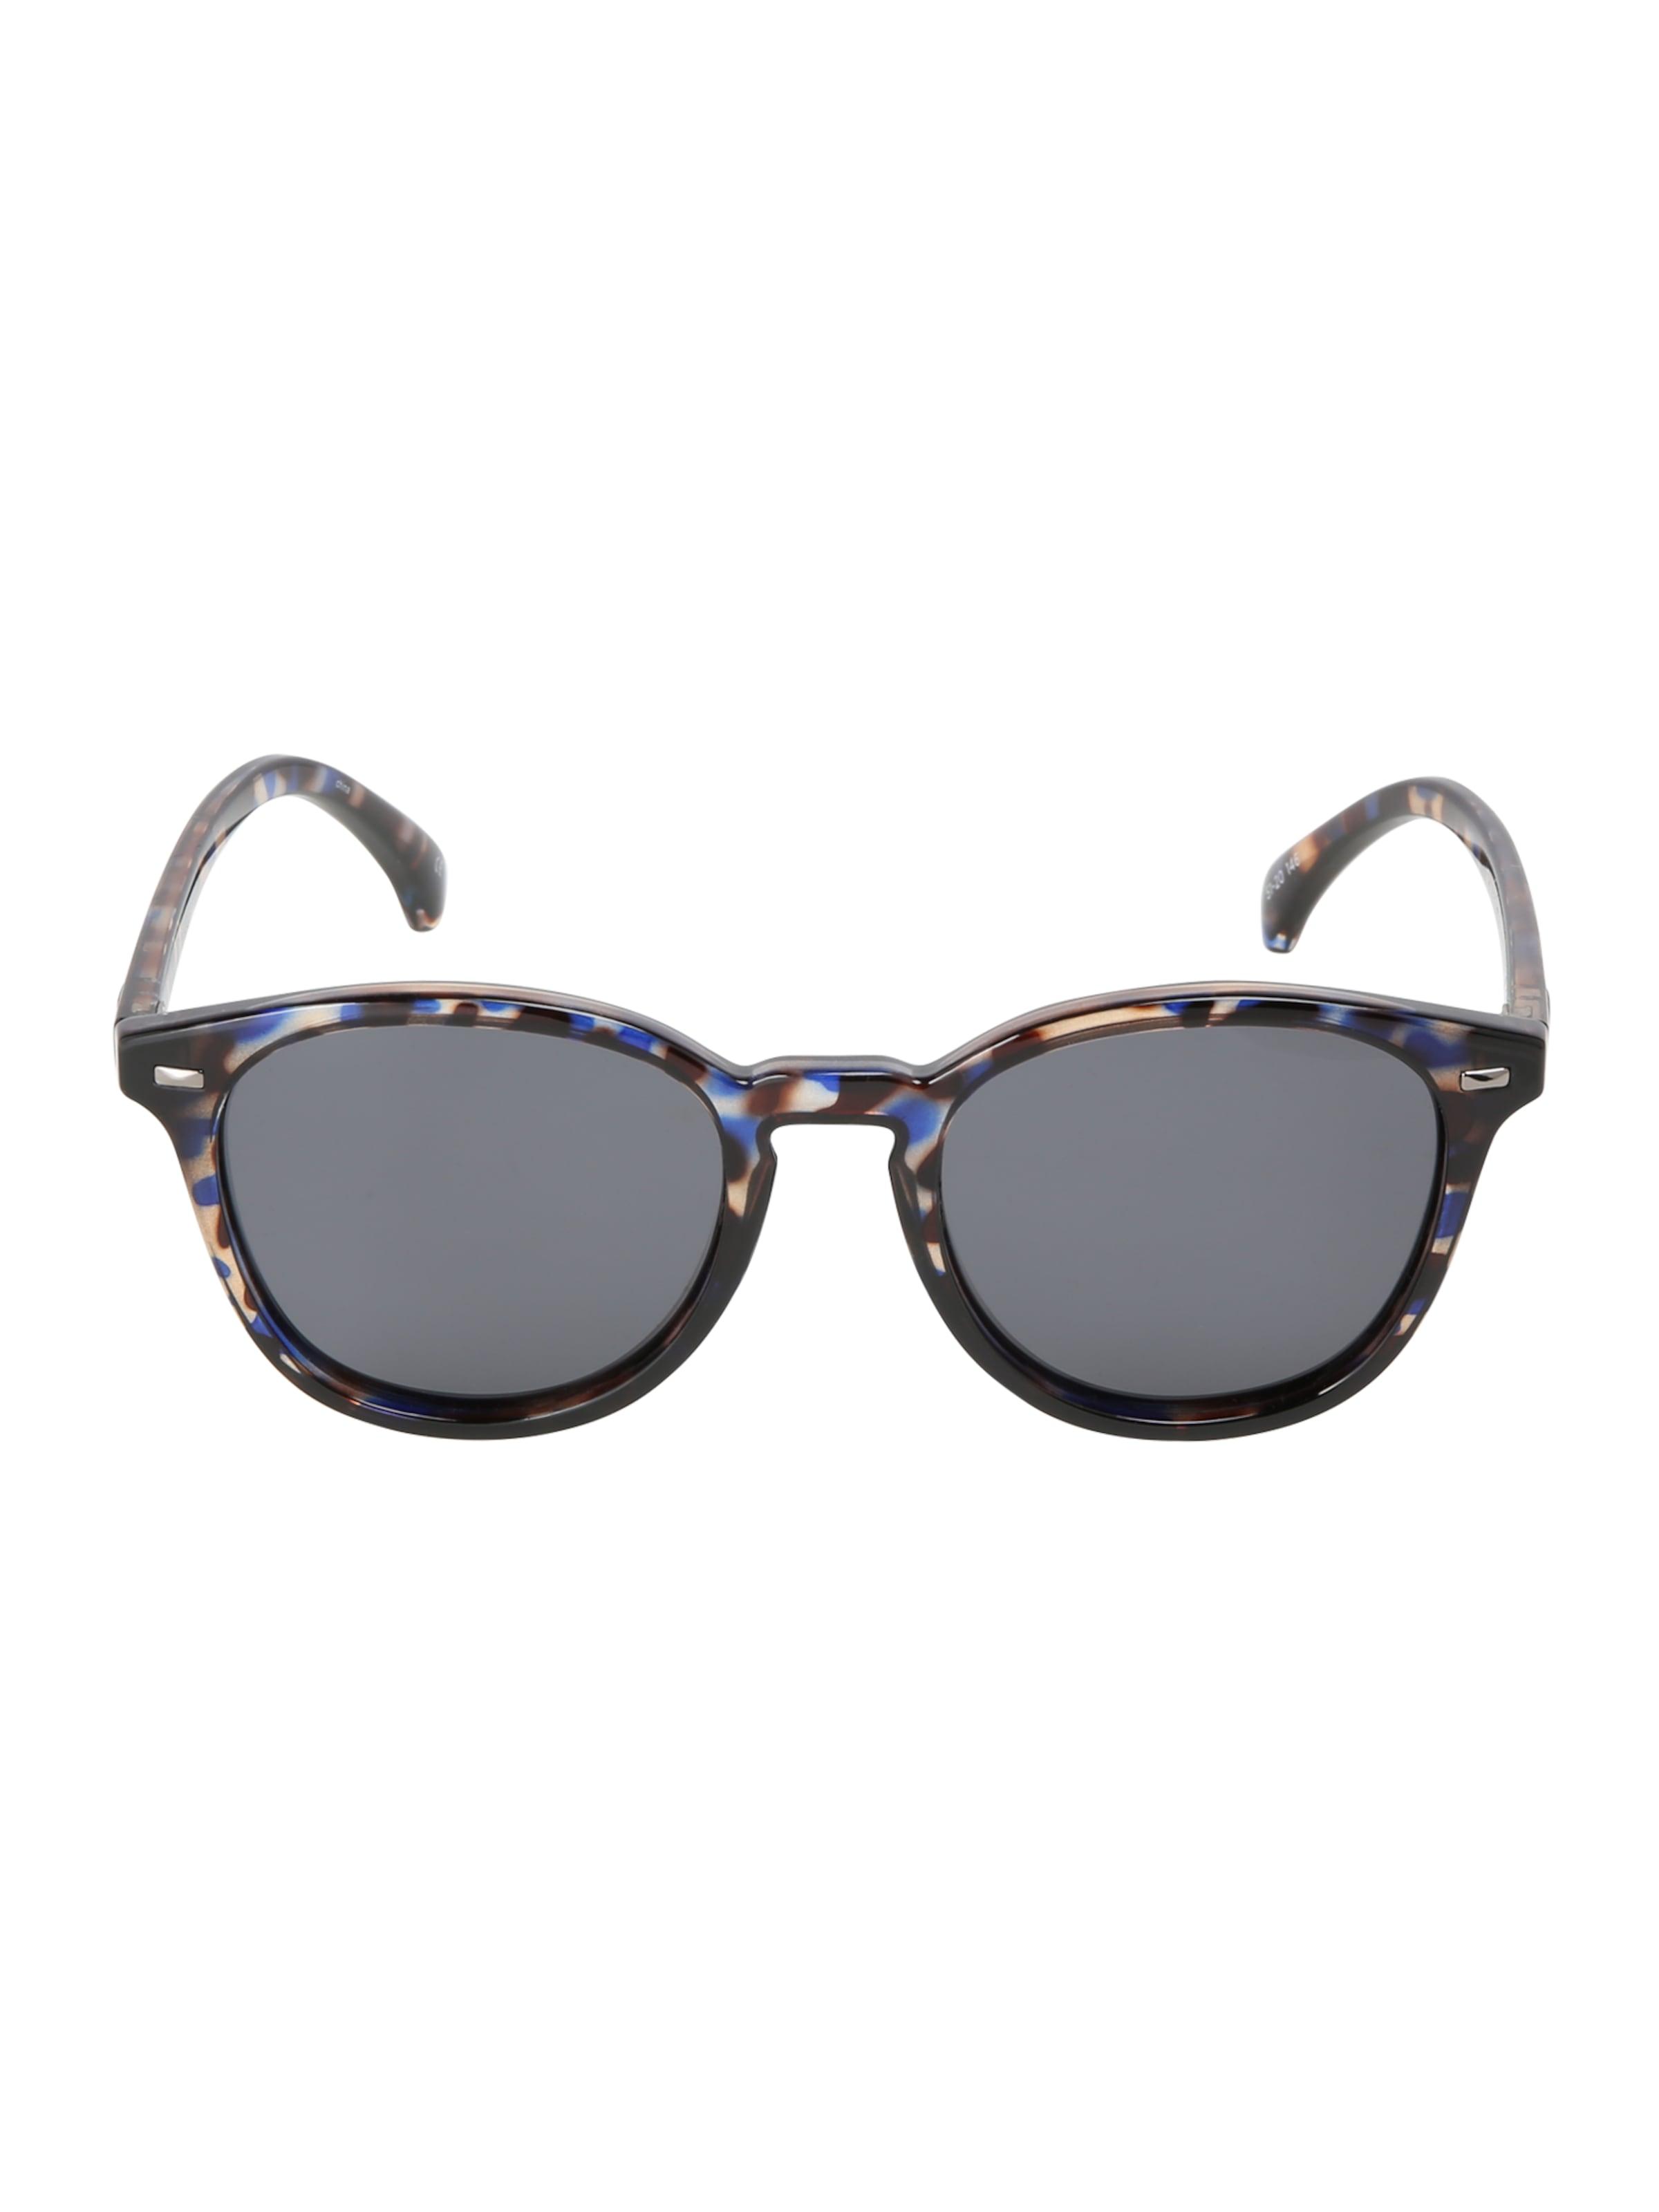 En 'bandwagon' Specs Bleu Le Lunettes MarineMarron De Soleil F3uK15TlJc